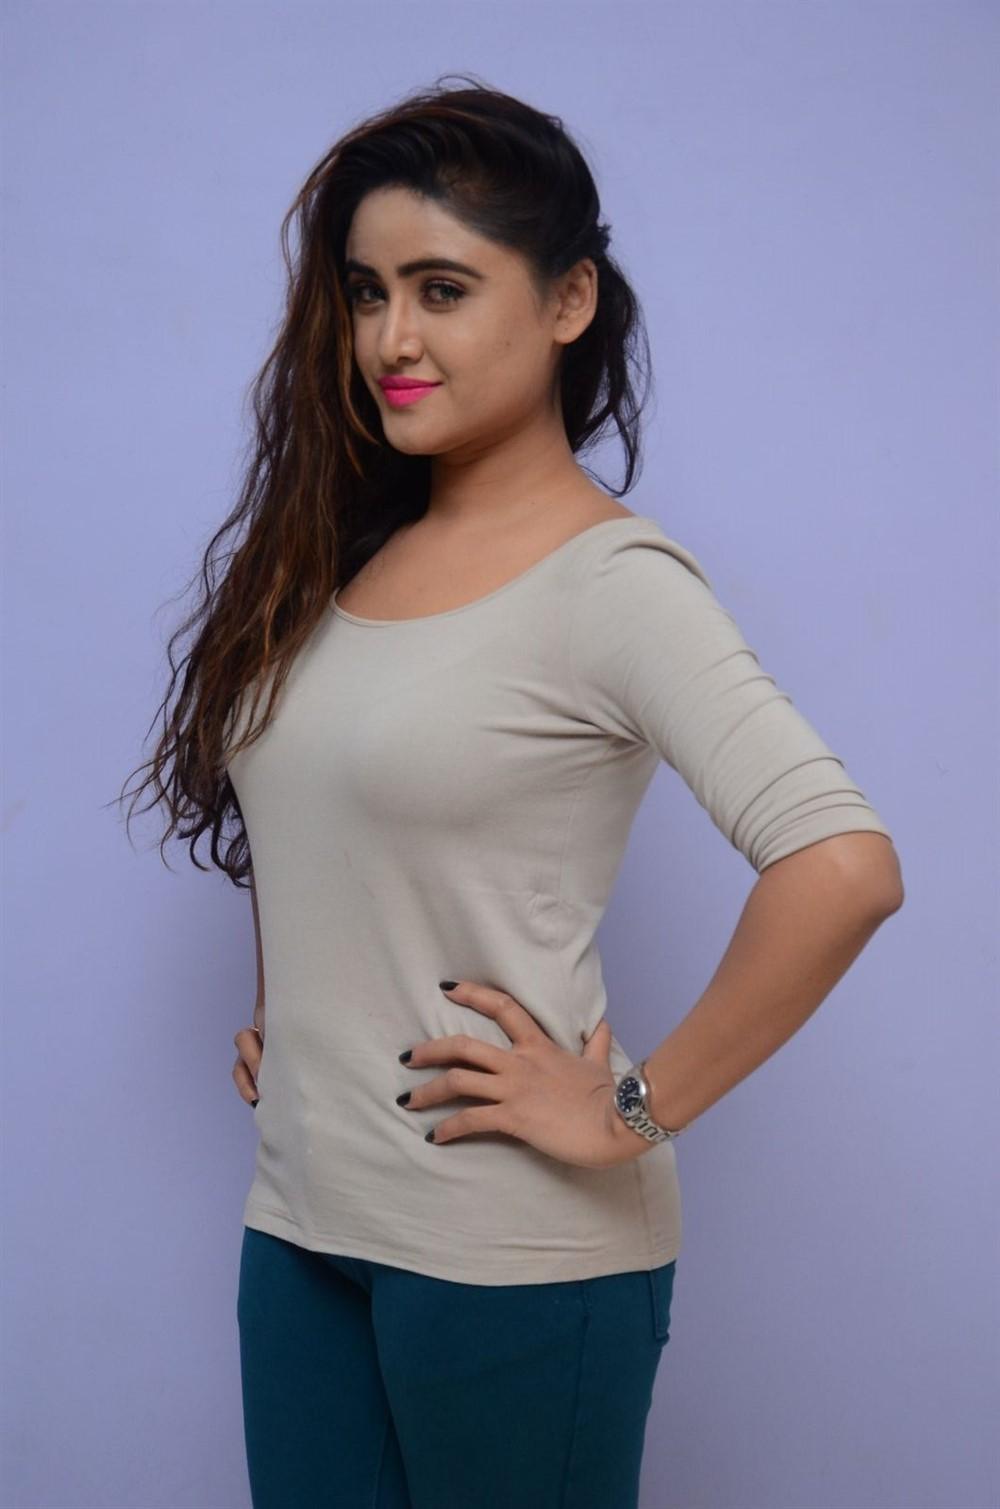 Telugu Actress Sony Charishta Photo Shoot Stills